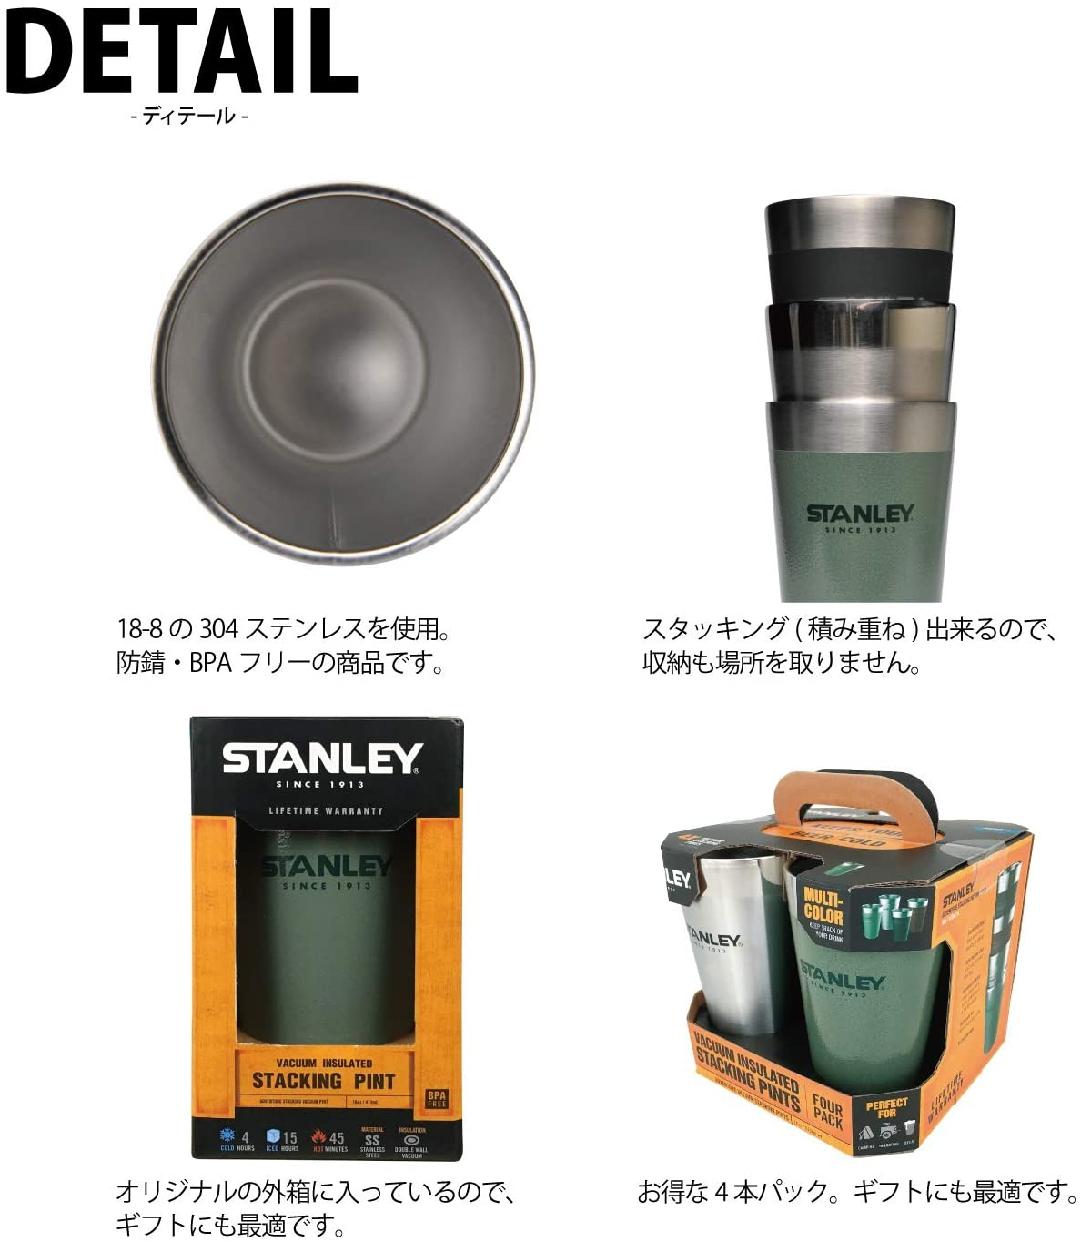 STANLEY(スタンレー) スタッキング真空パイント 0.47Lの商品画像5